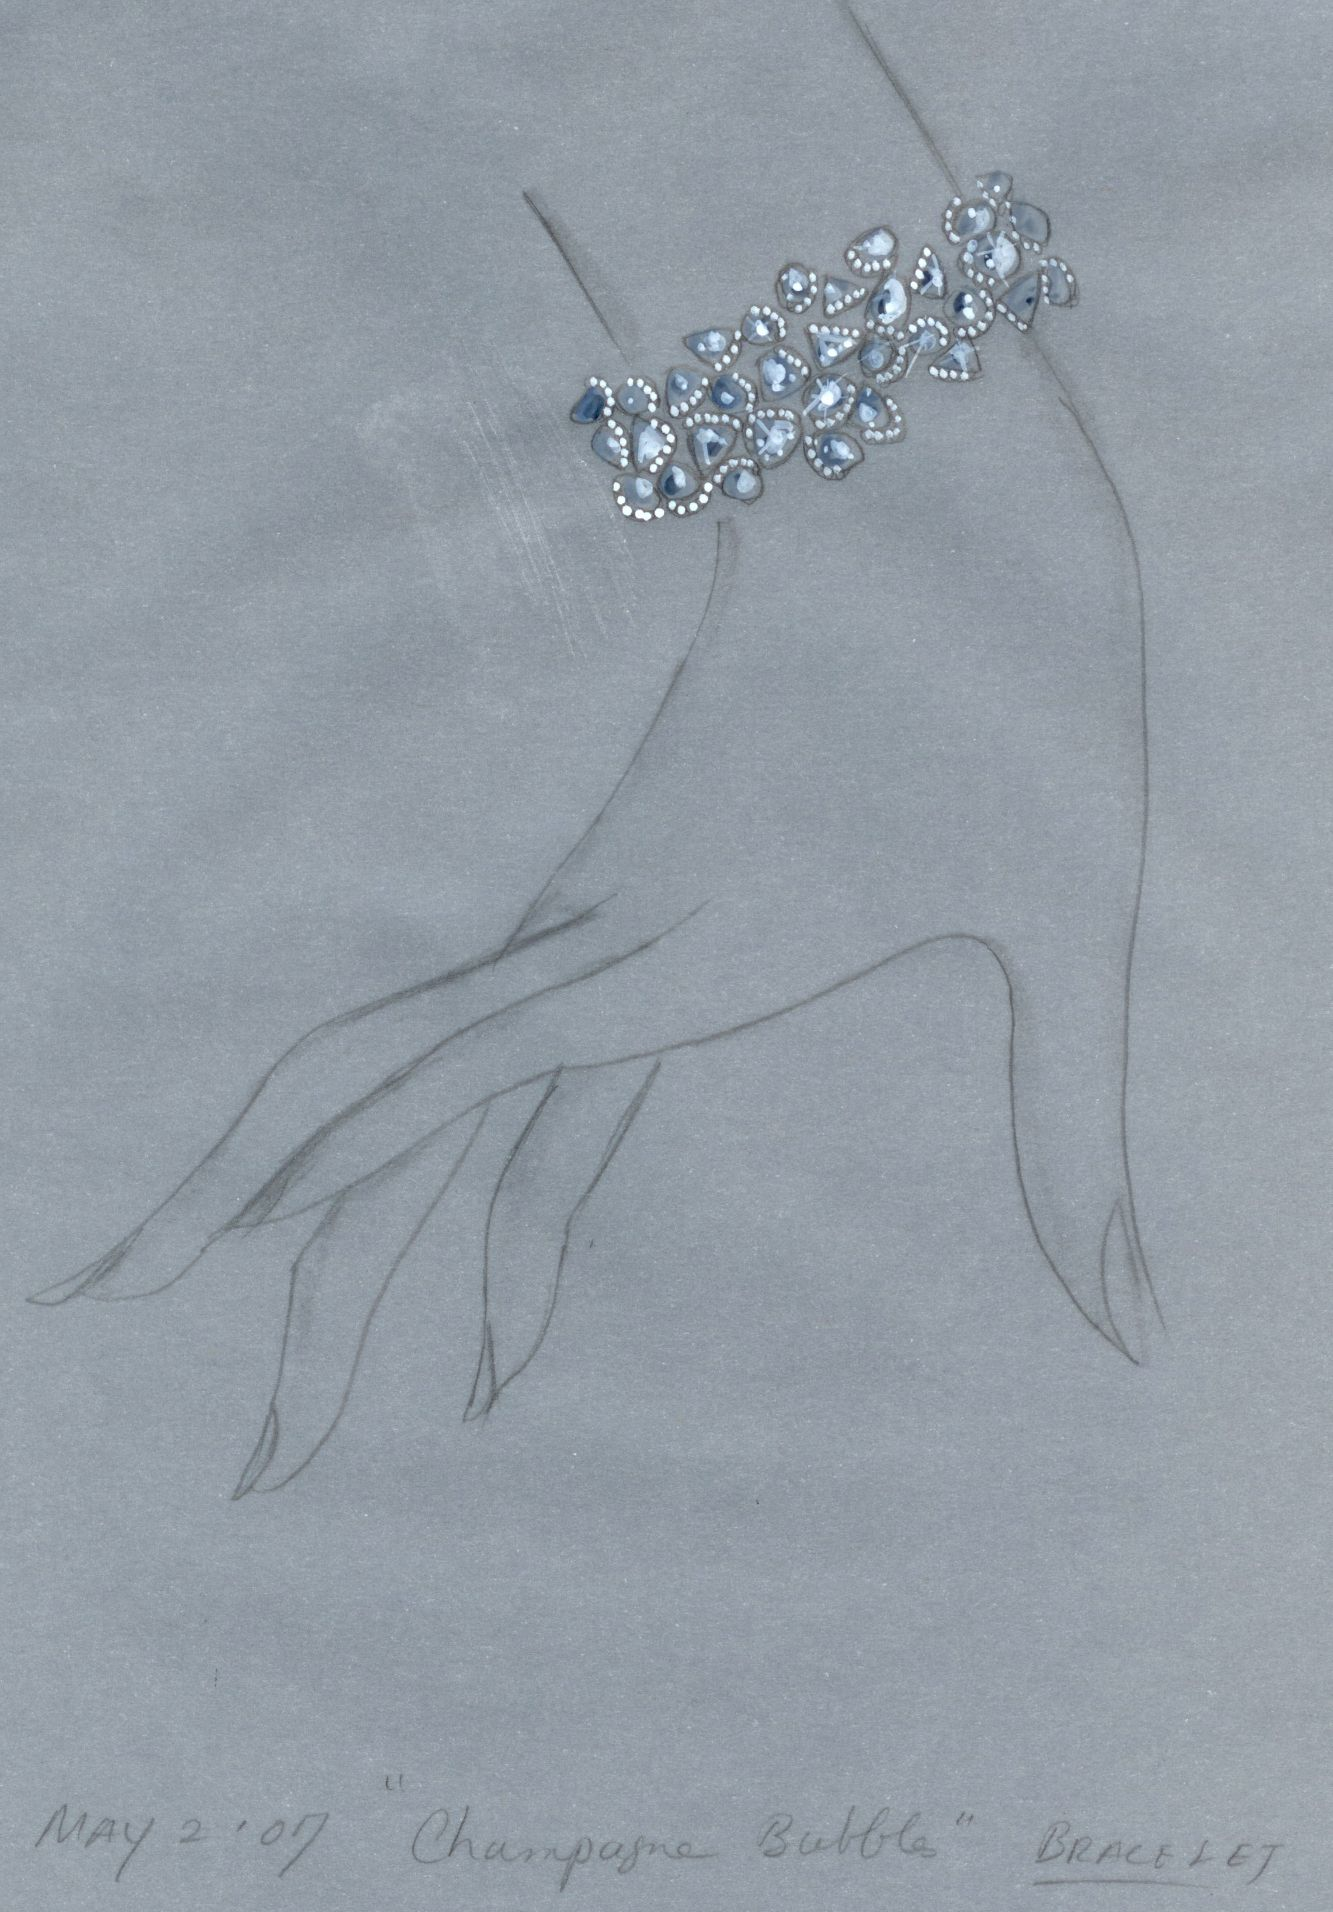 Art illustration design bracelet bracelets pinterest diseño